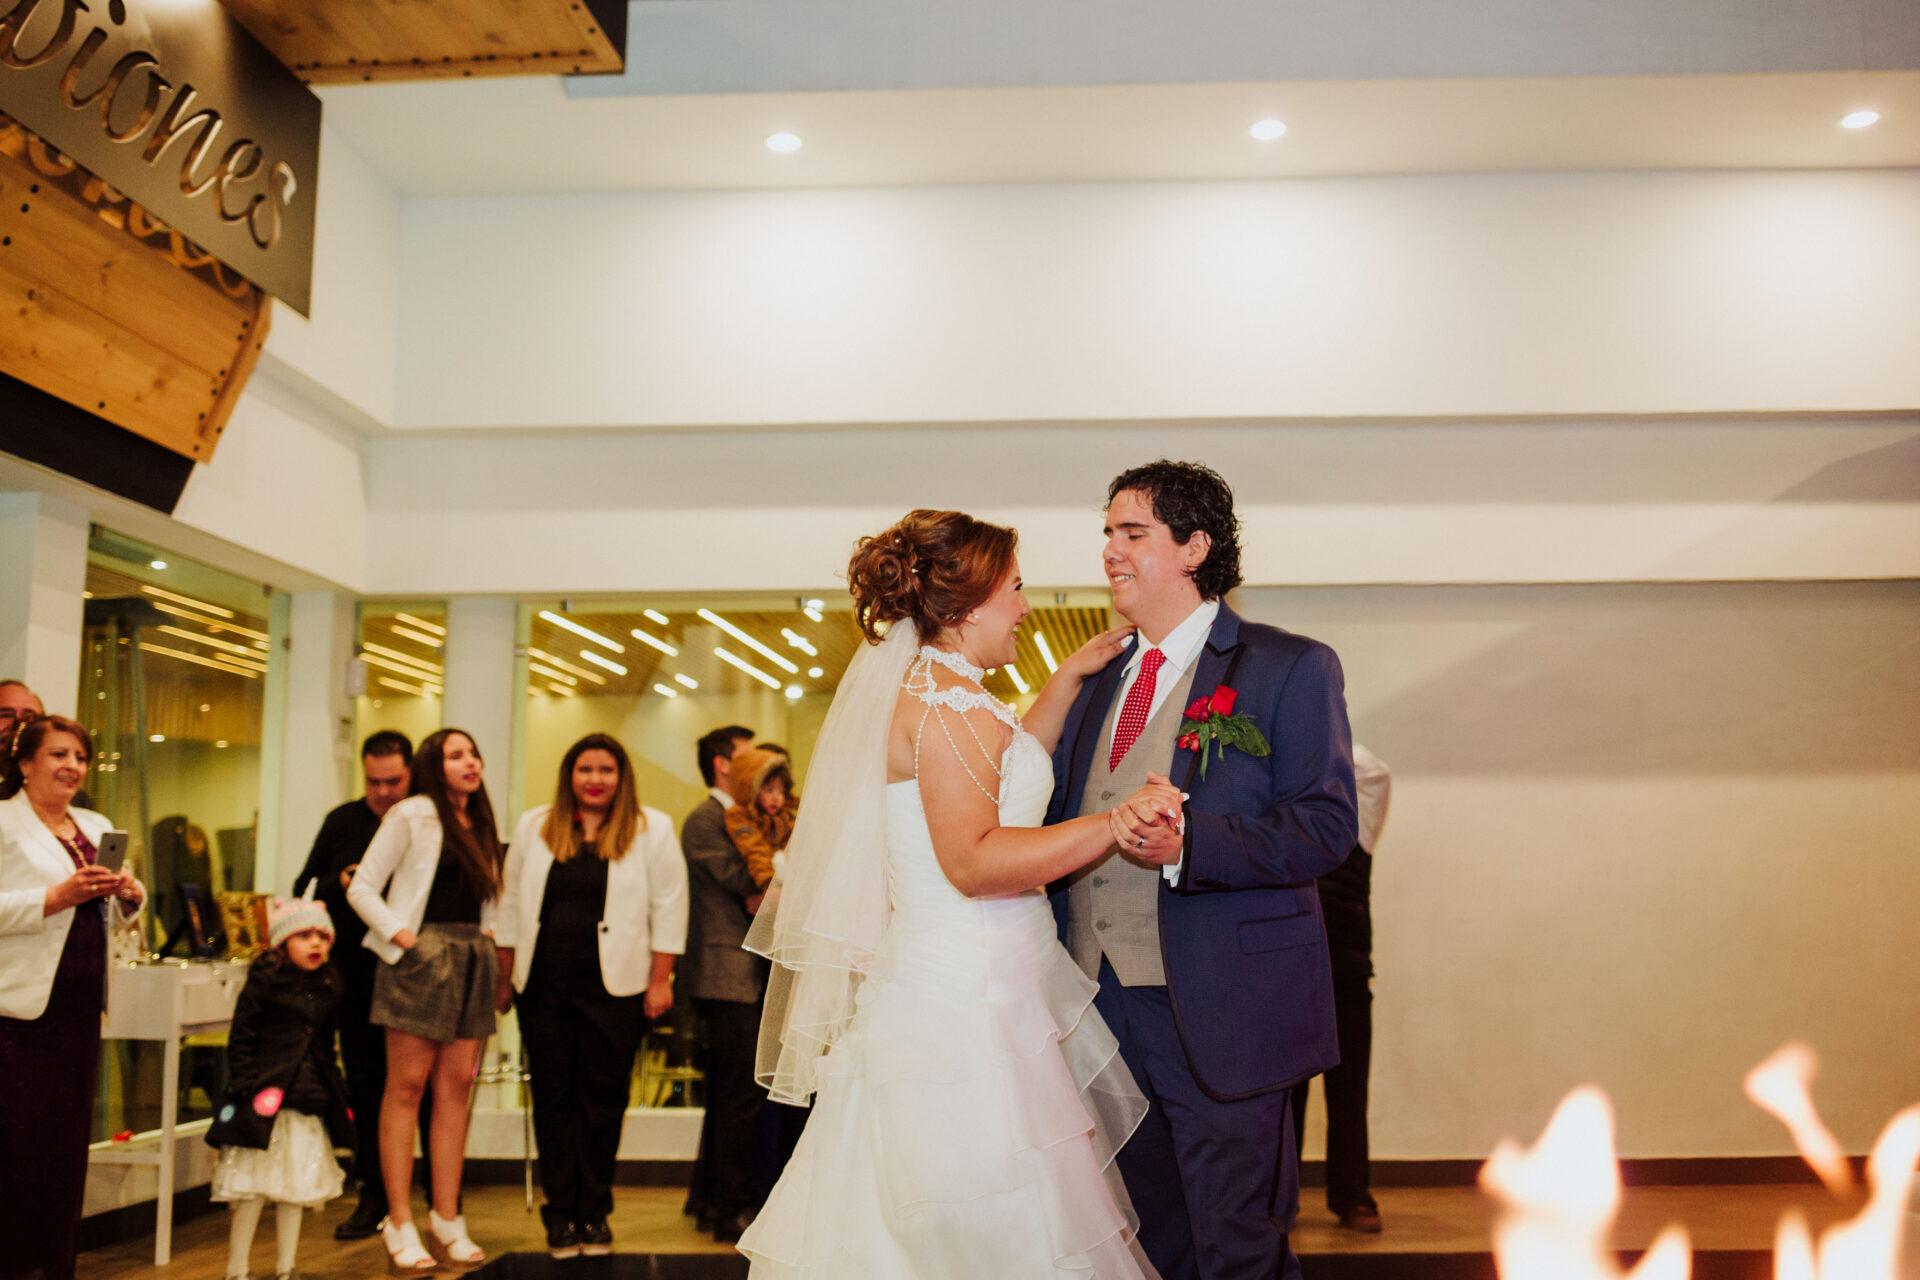 javier_noriega_fotografo_bodas_gaviones_zacatecas_wedding_photographer32